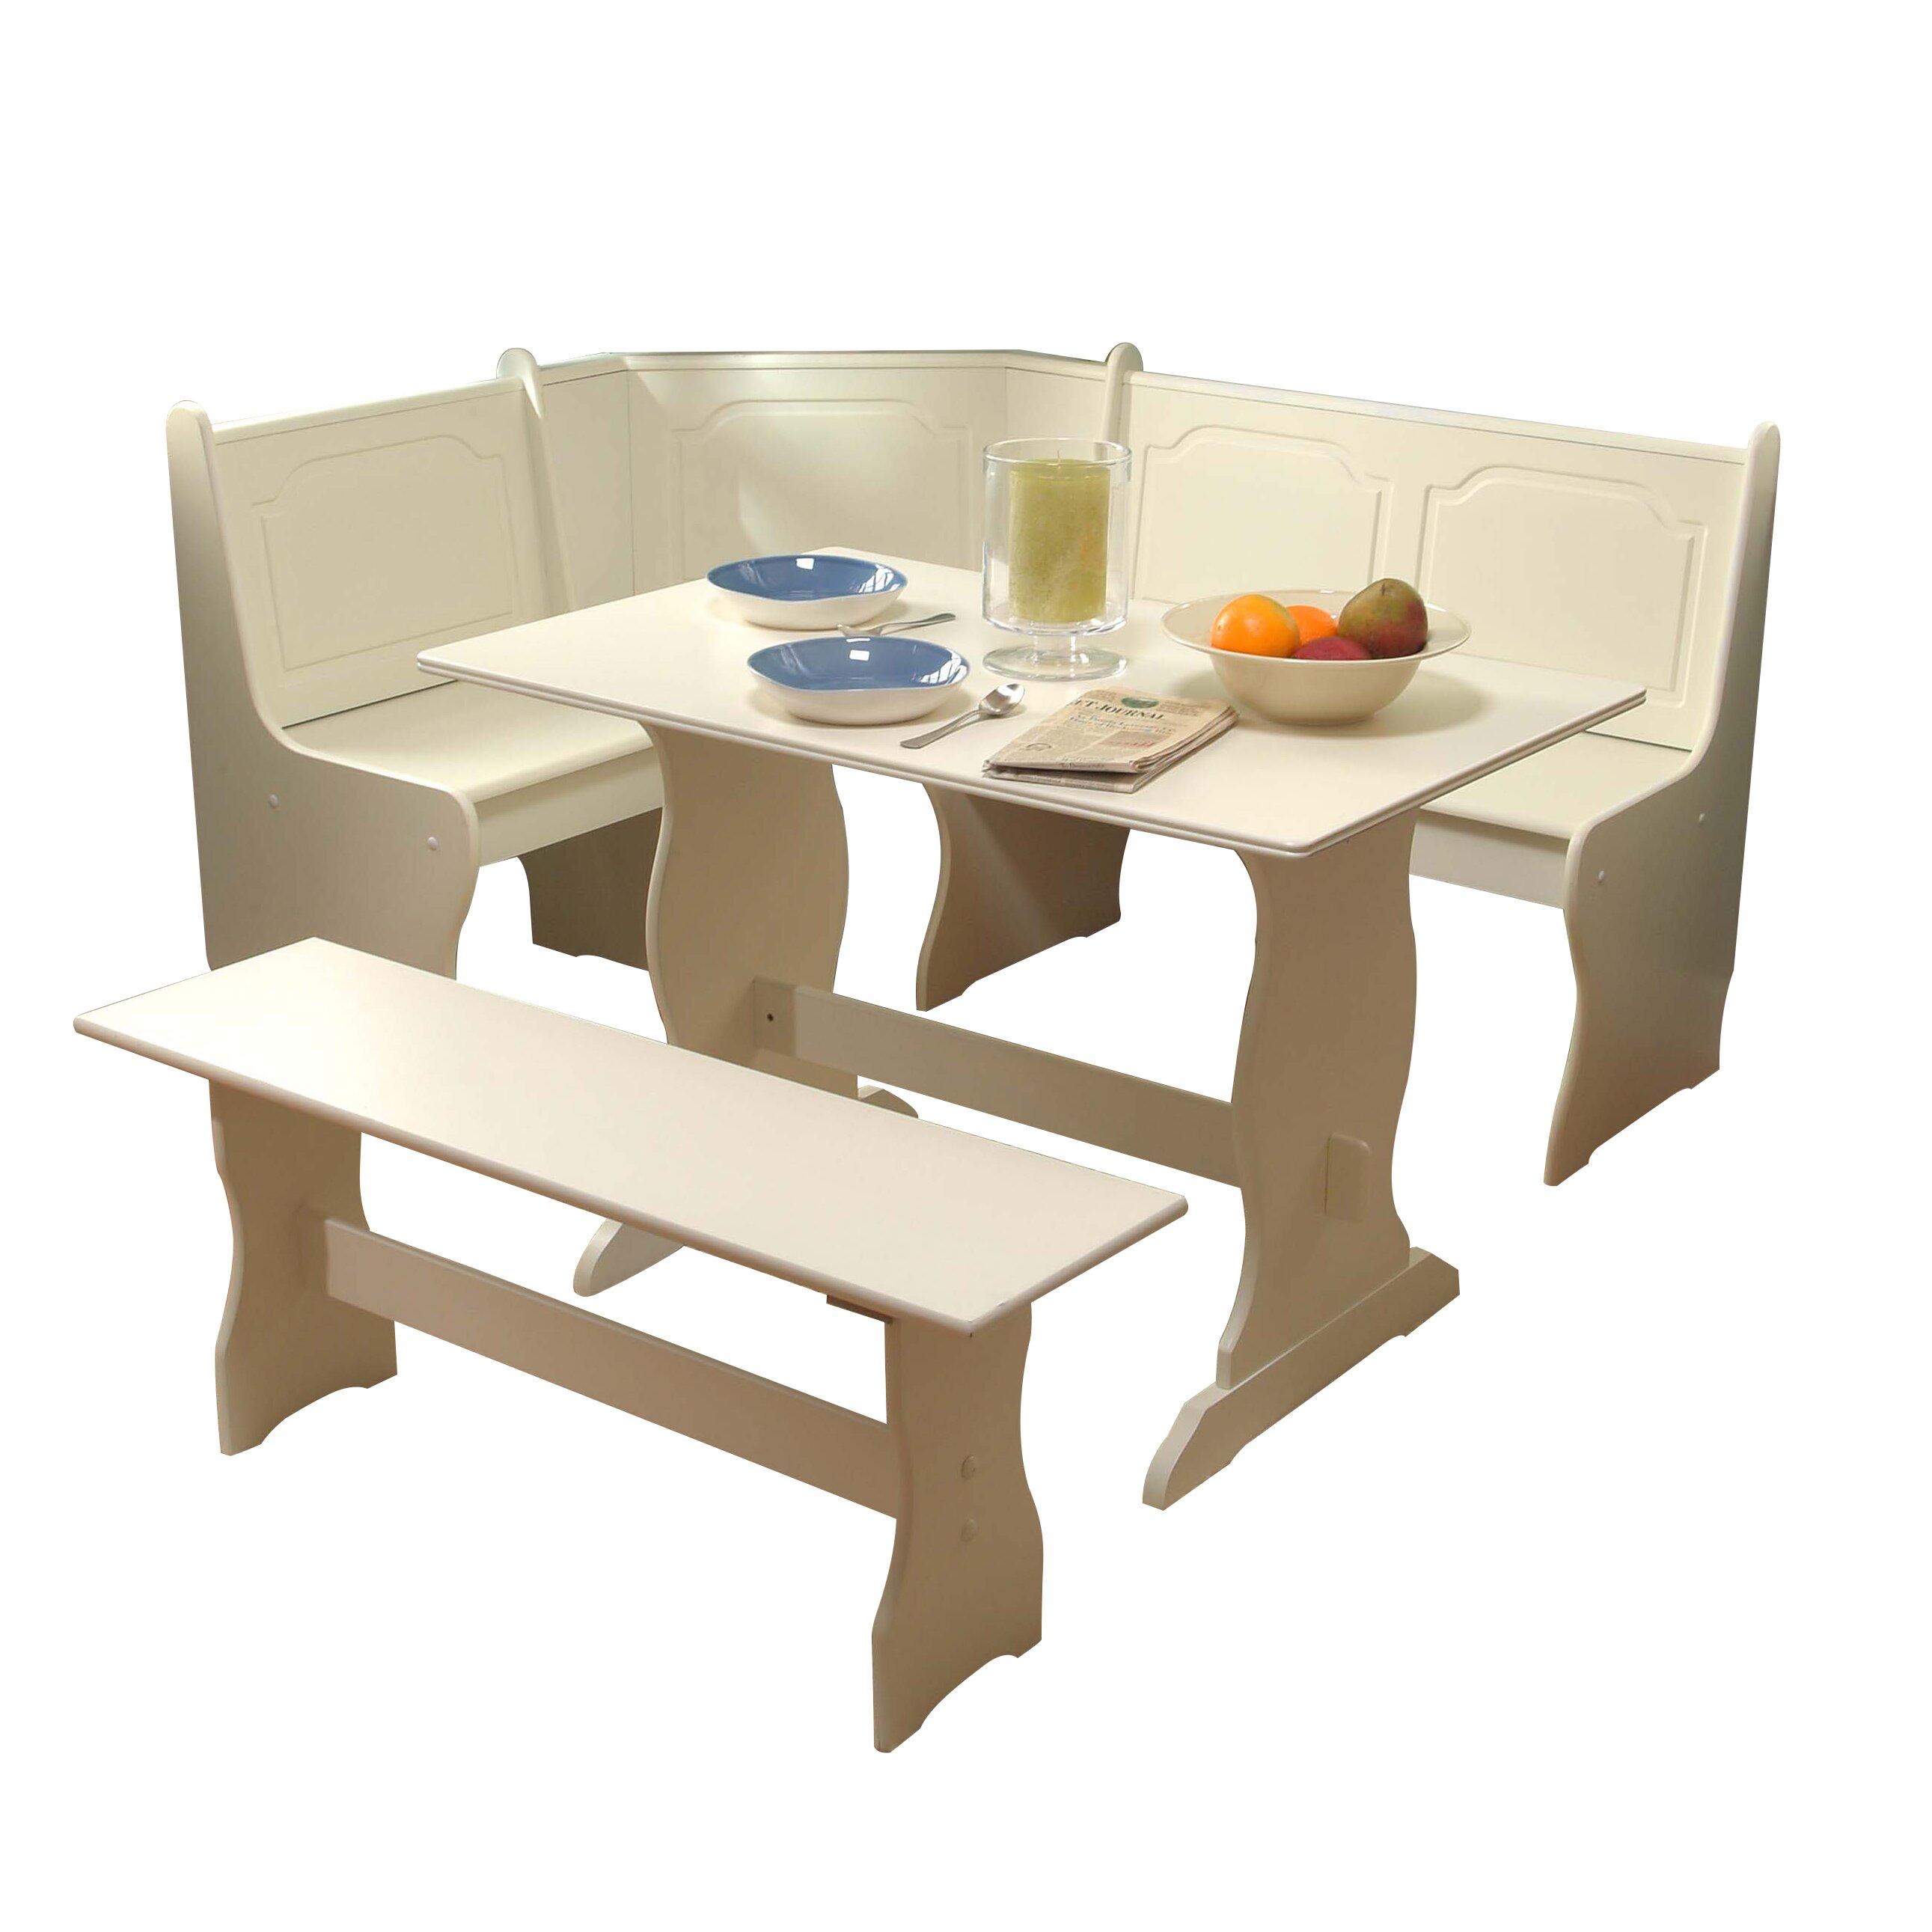 Superb img of Kitchen & Dining Furniture 3 Piece Kitchen & Dining Room Sets  with #AF6C1C color and 2582x2582 pixels